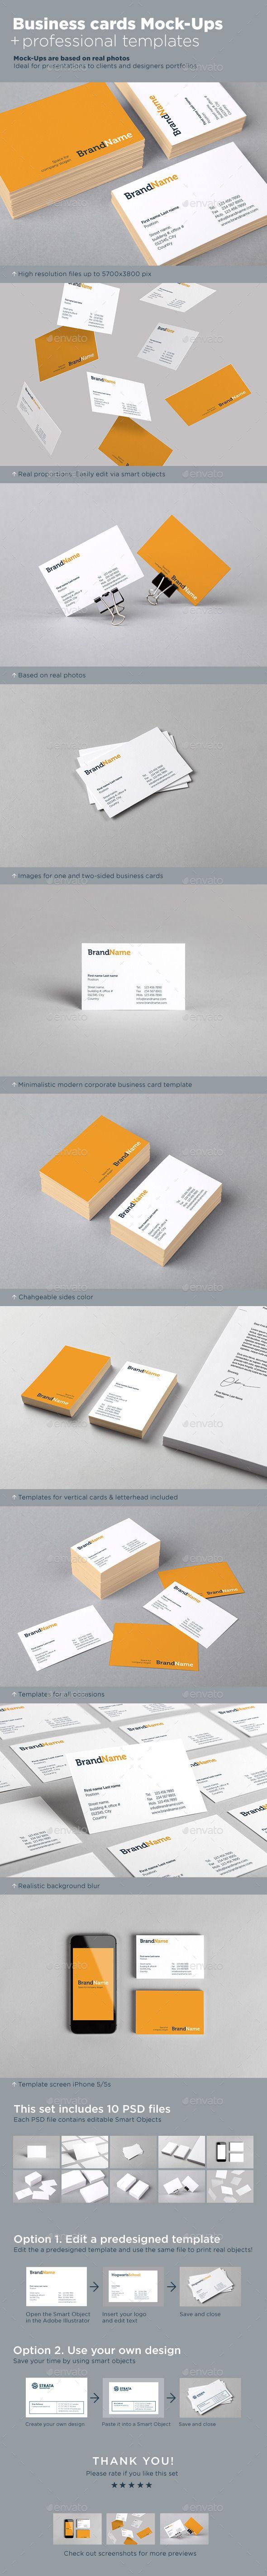 Business Cards Mock Ups Template Pinterest